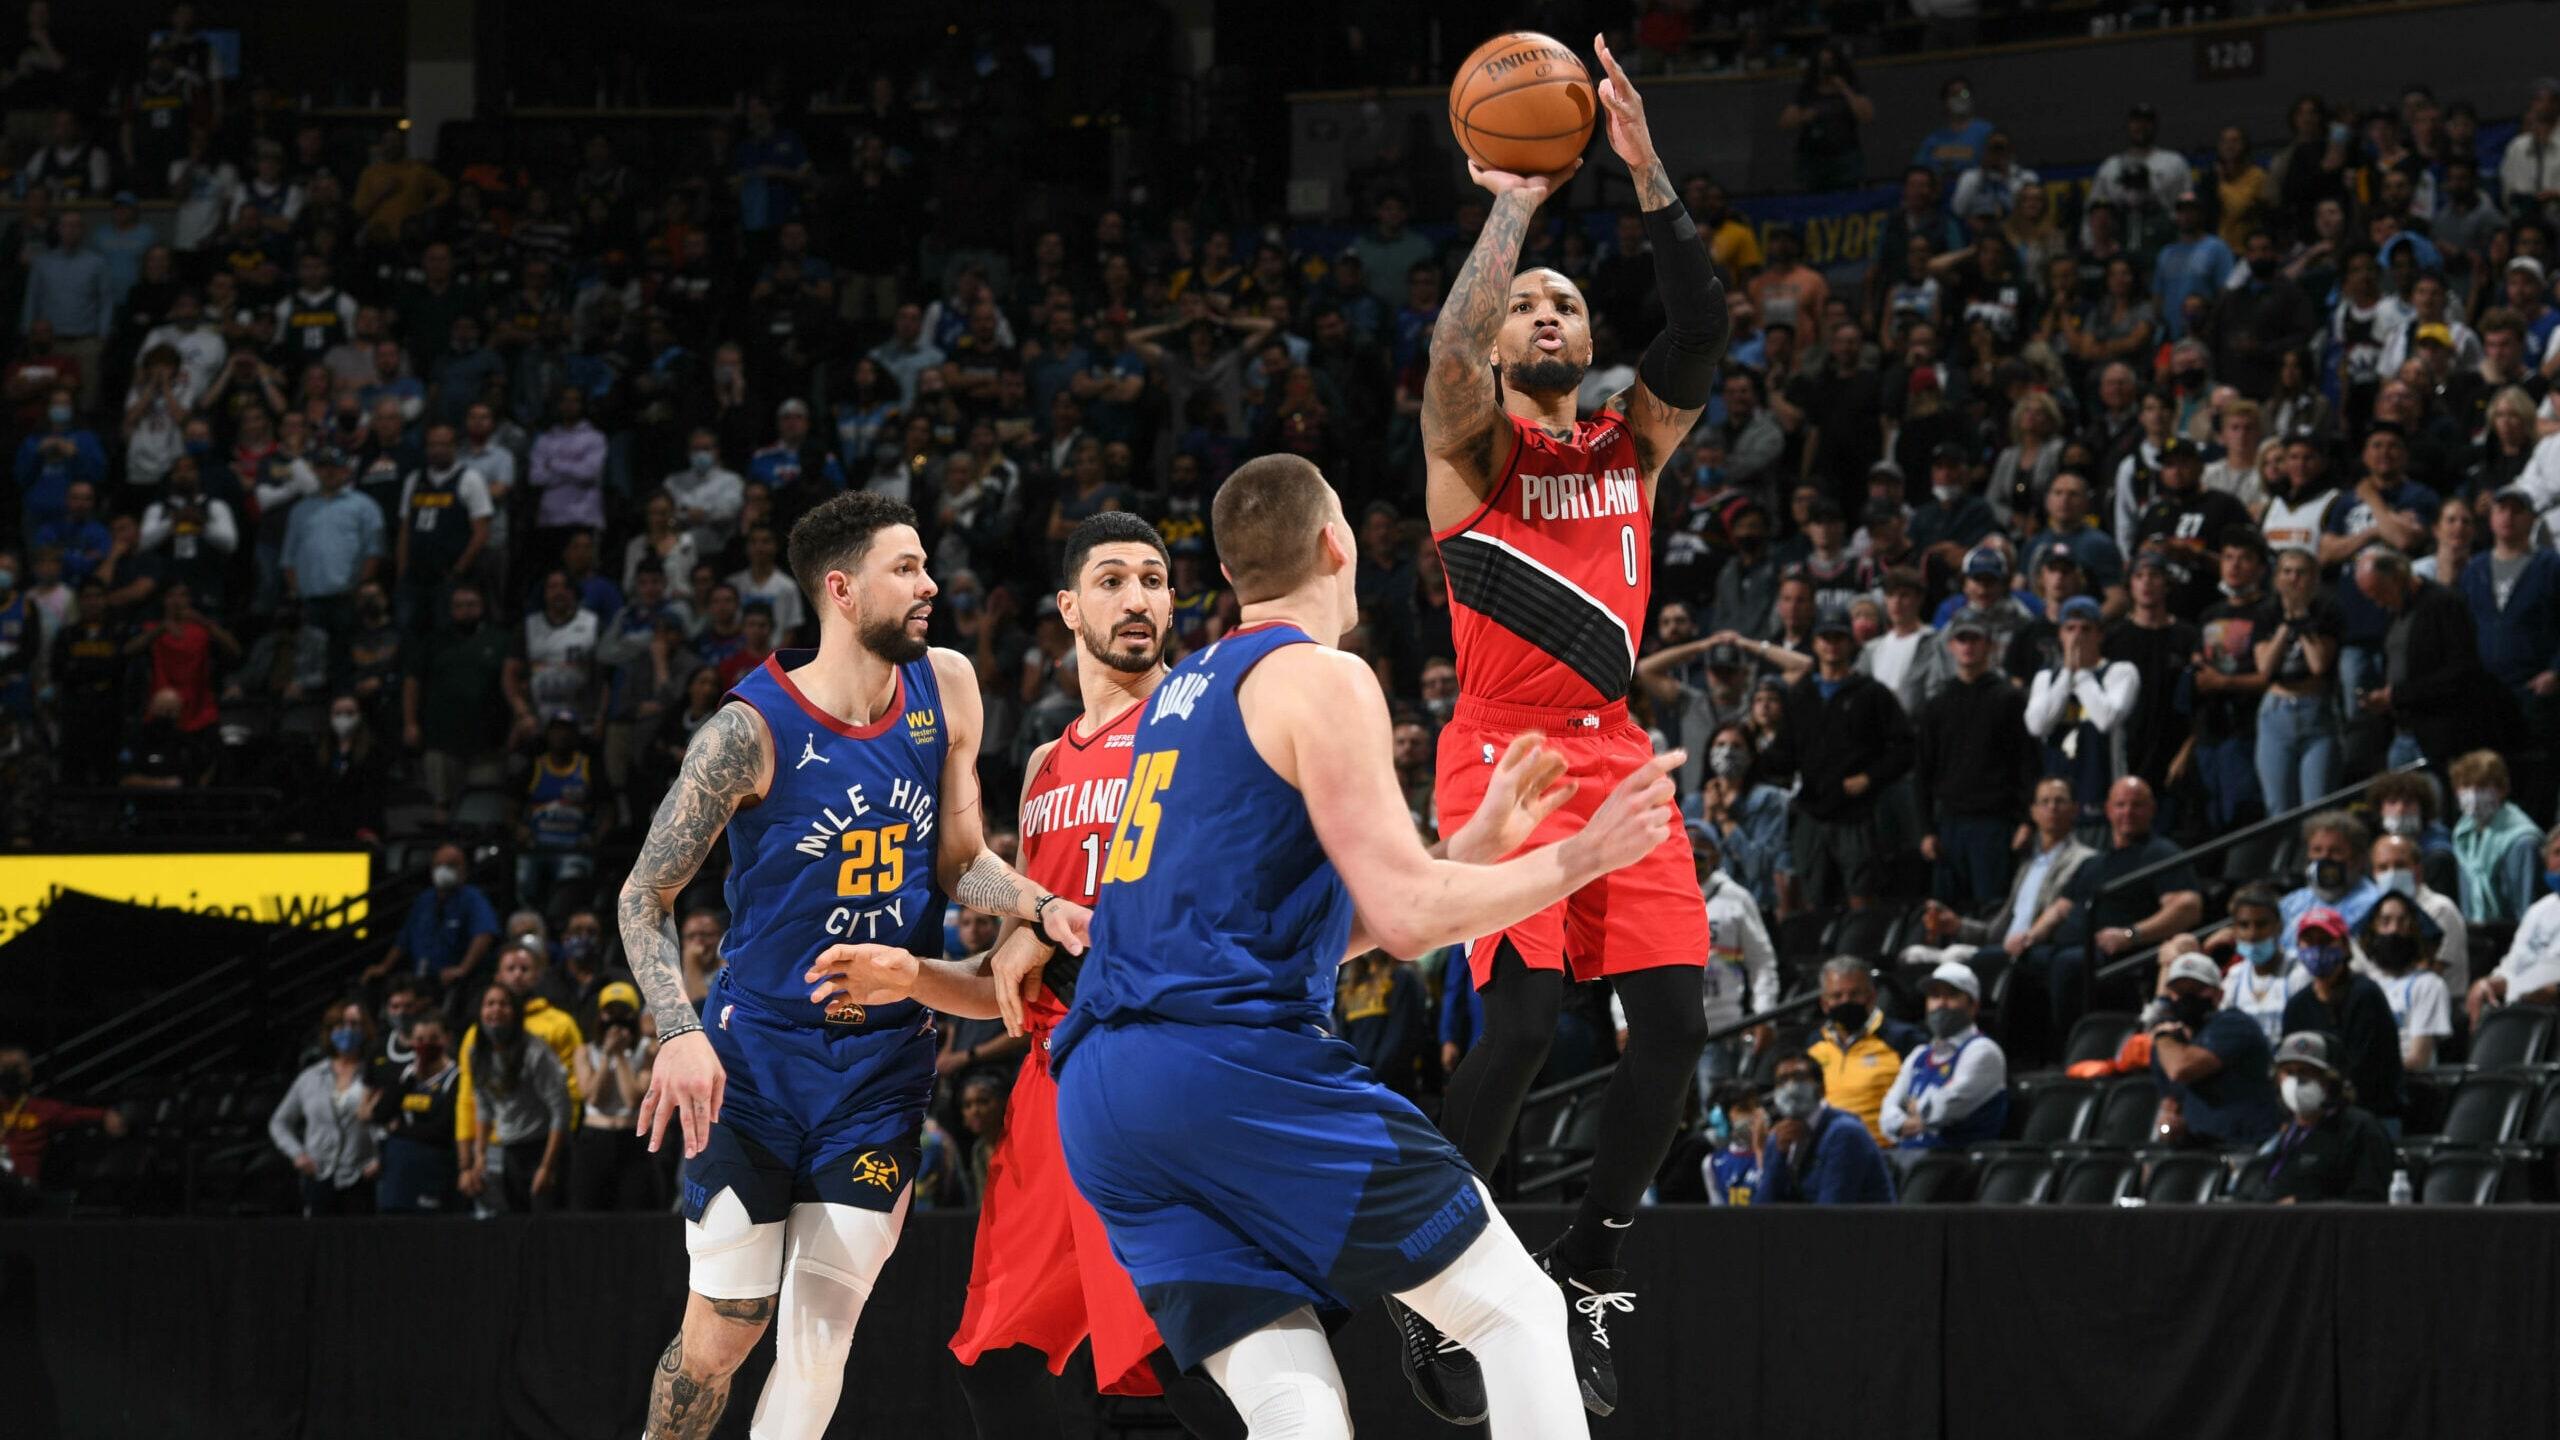 NBA players react to Damian Lillard's 55-point performance